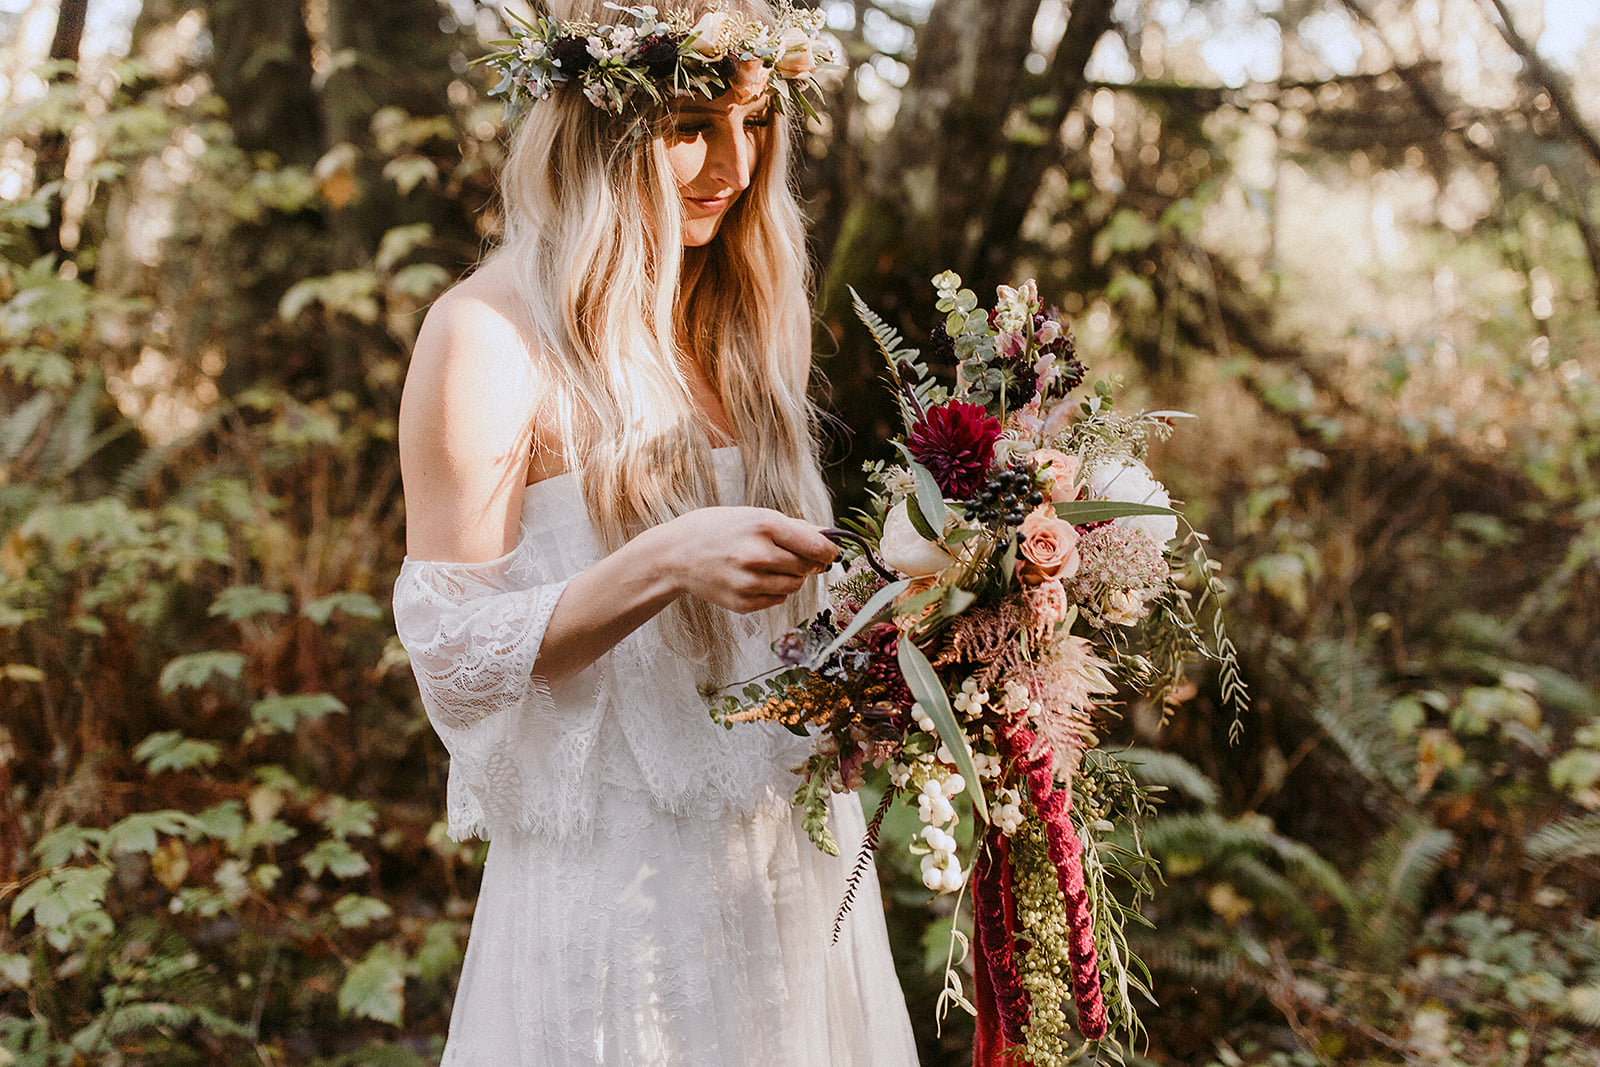 beaulodge-wedding-bellingham-520.jpg